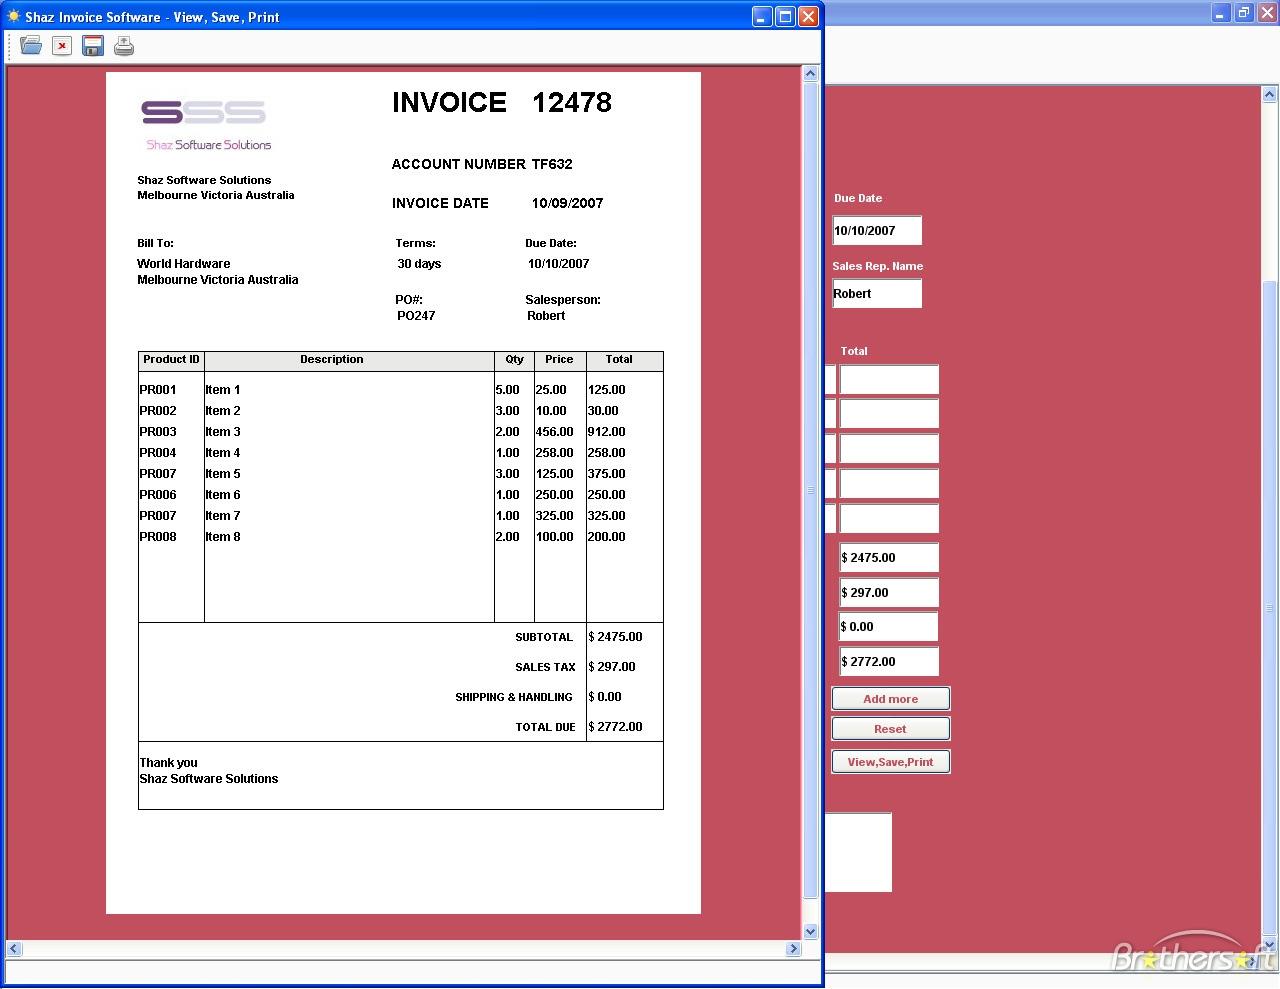 download free shaz invoice software shaz invoice software 100 freeware invoice software